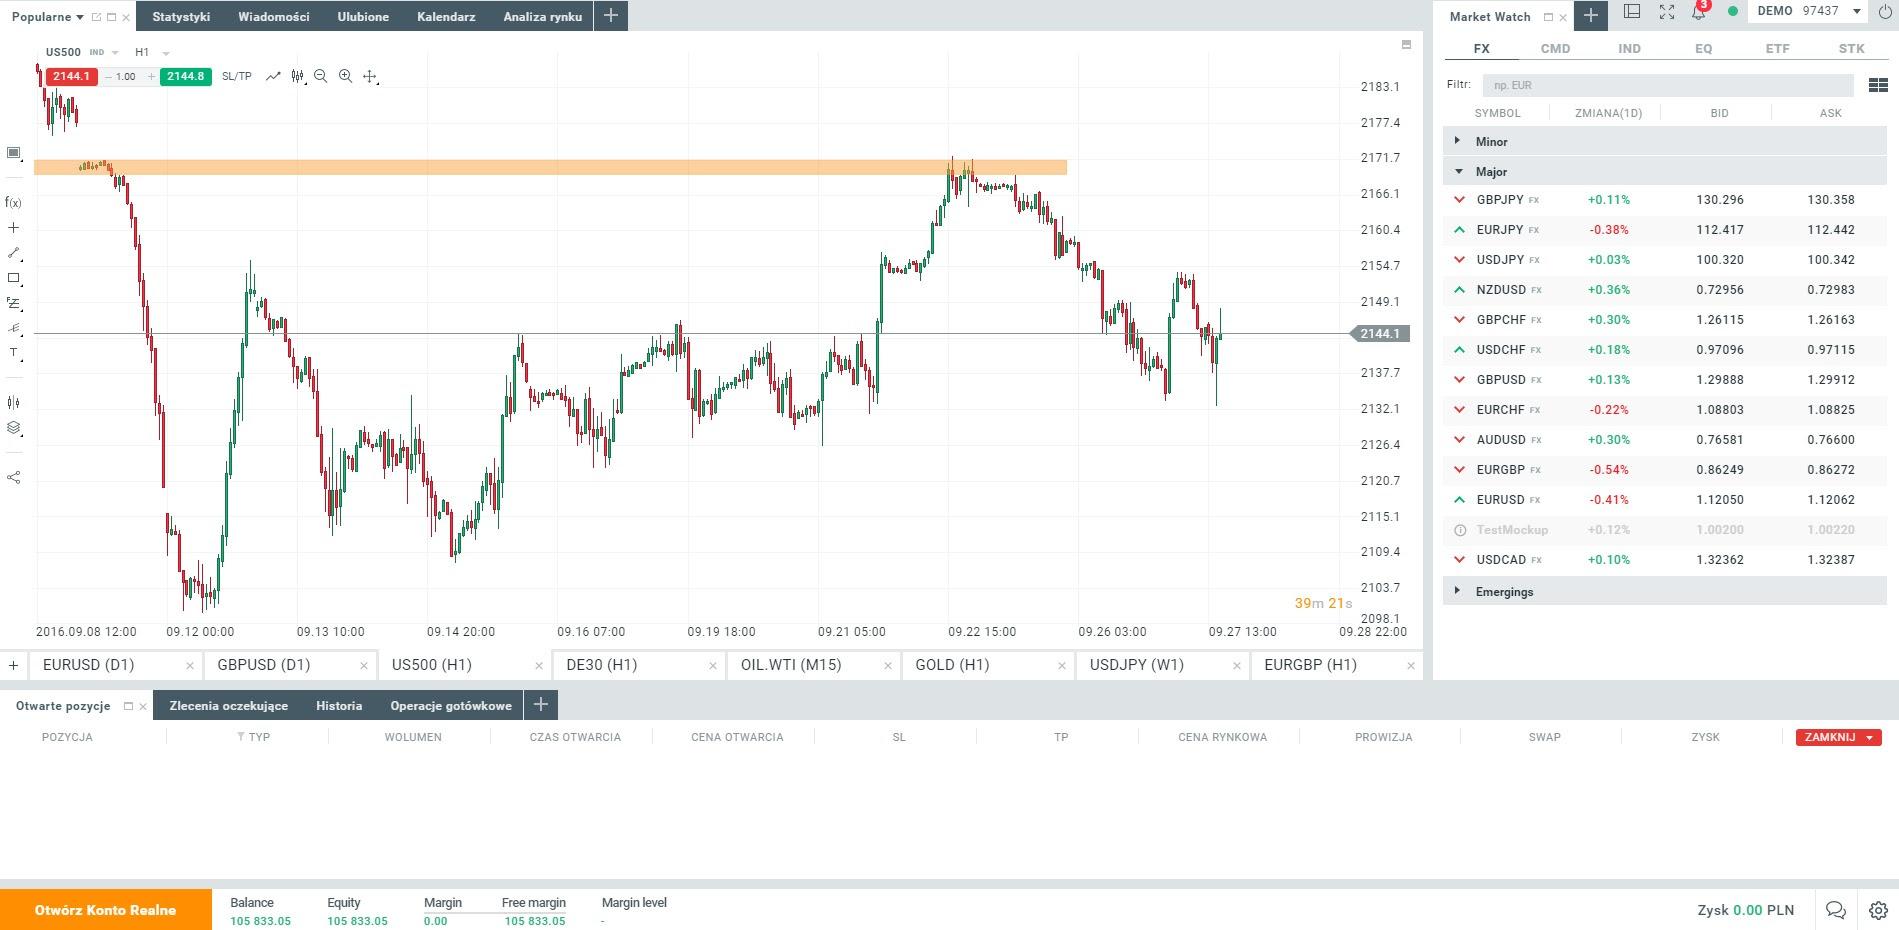 Форекс новости валютного рынка прогноз валют: Bmfn forex india.